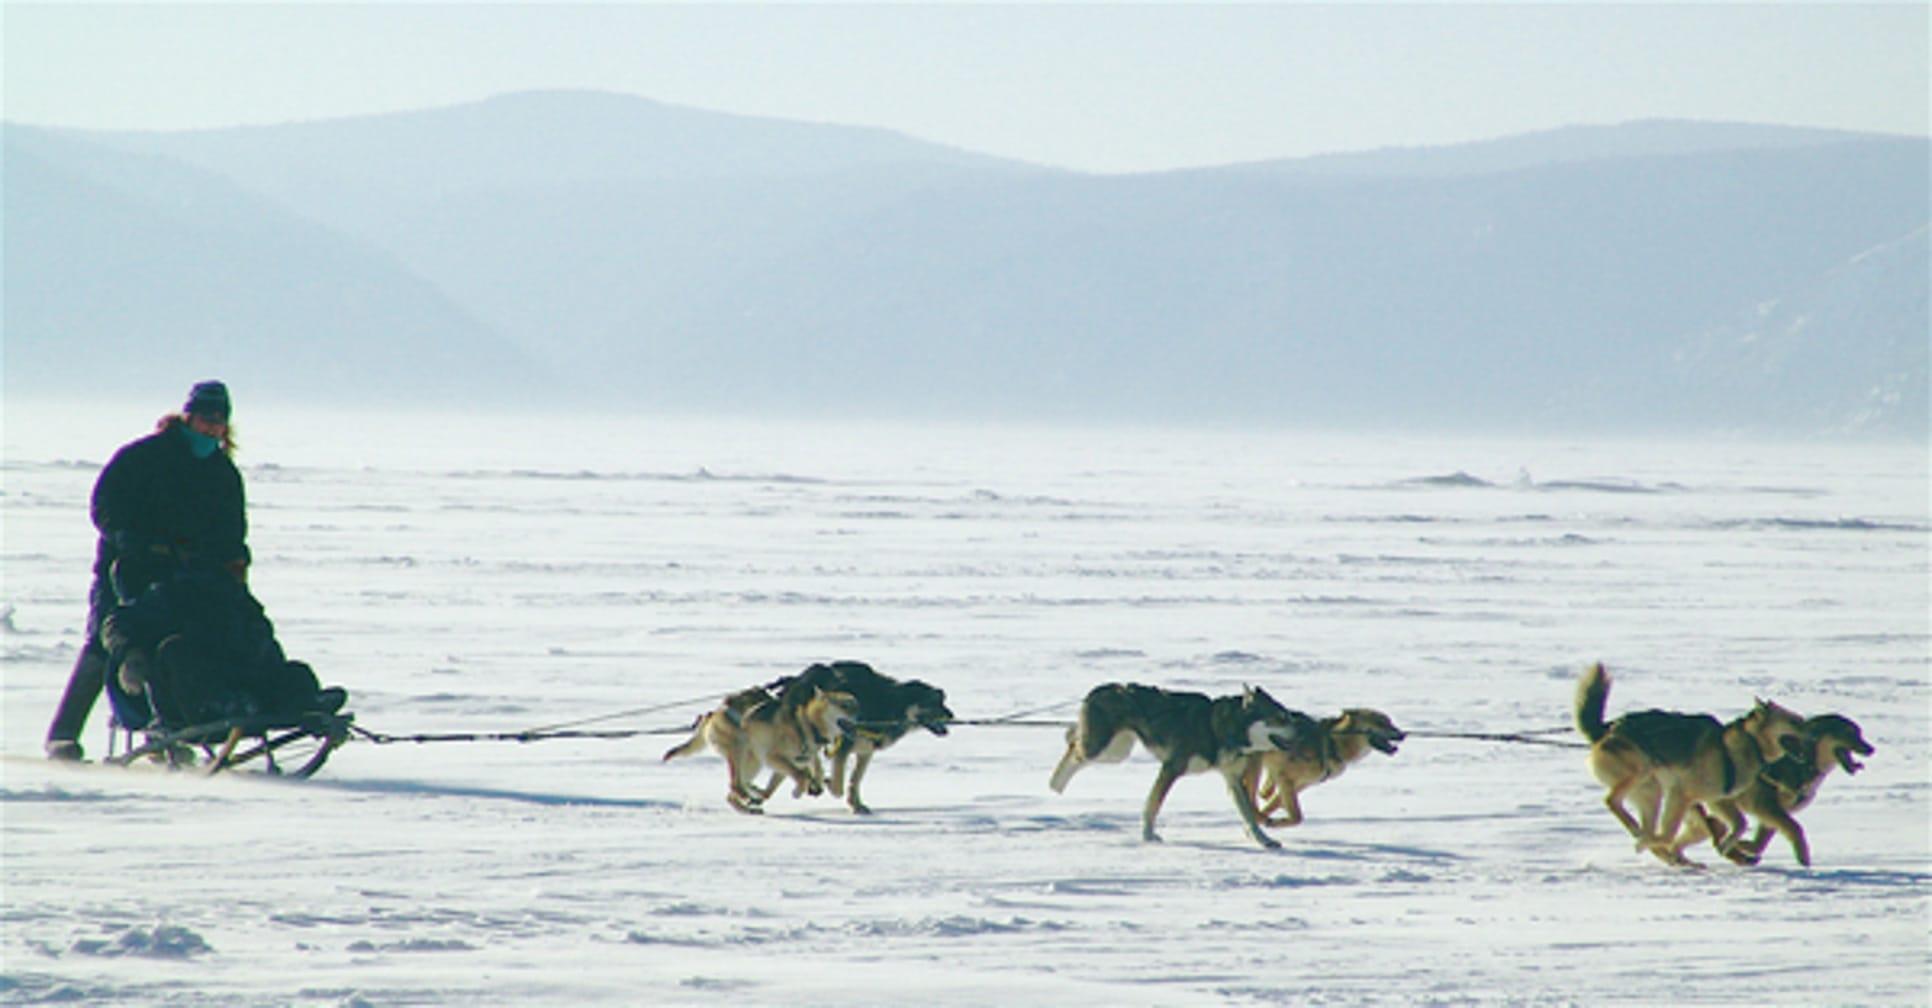 Dog sledding on the Trans-Siberian Winter Wonderland by Steam journey